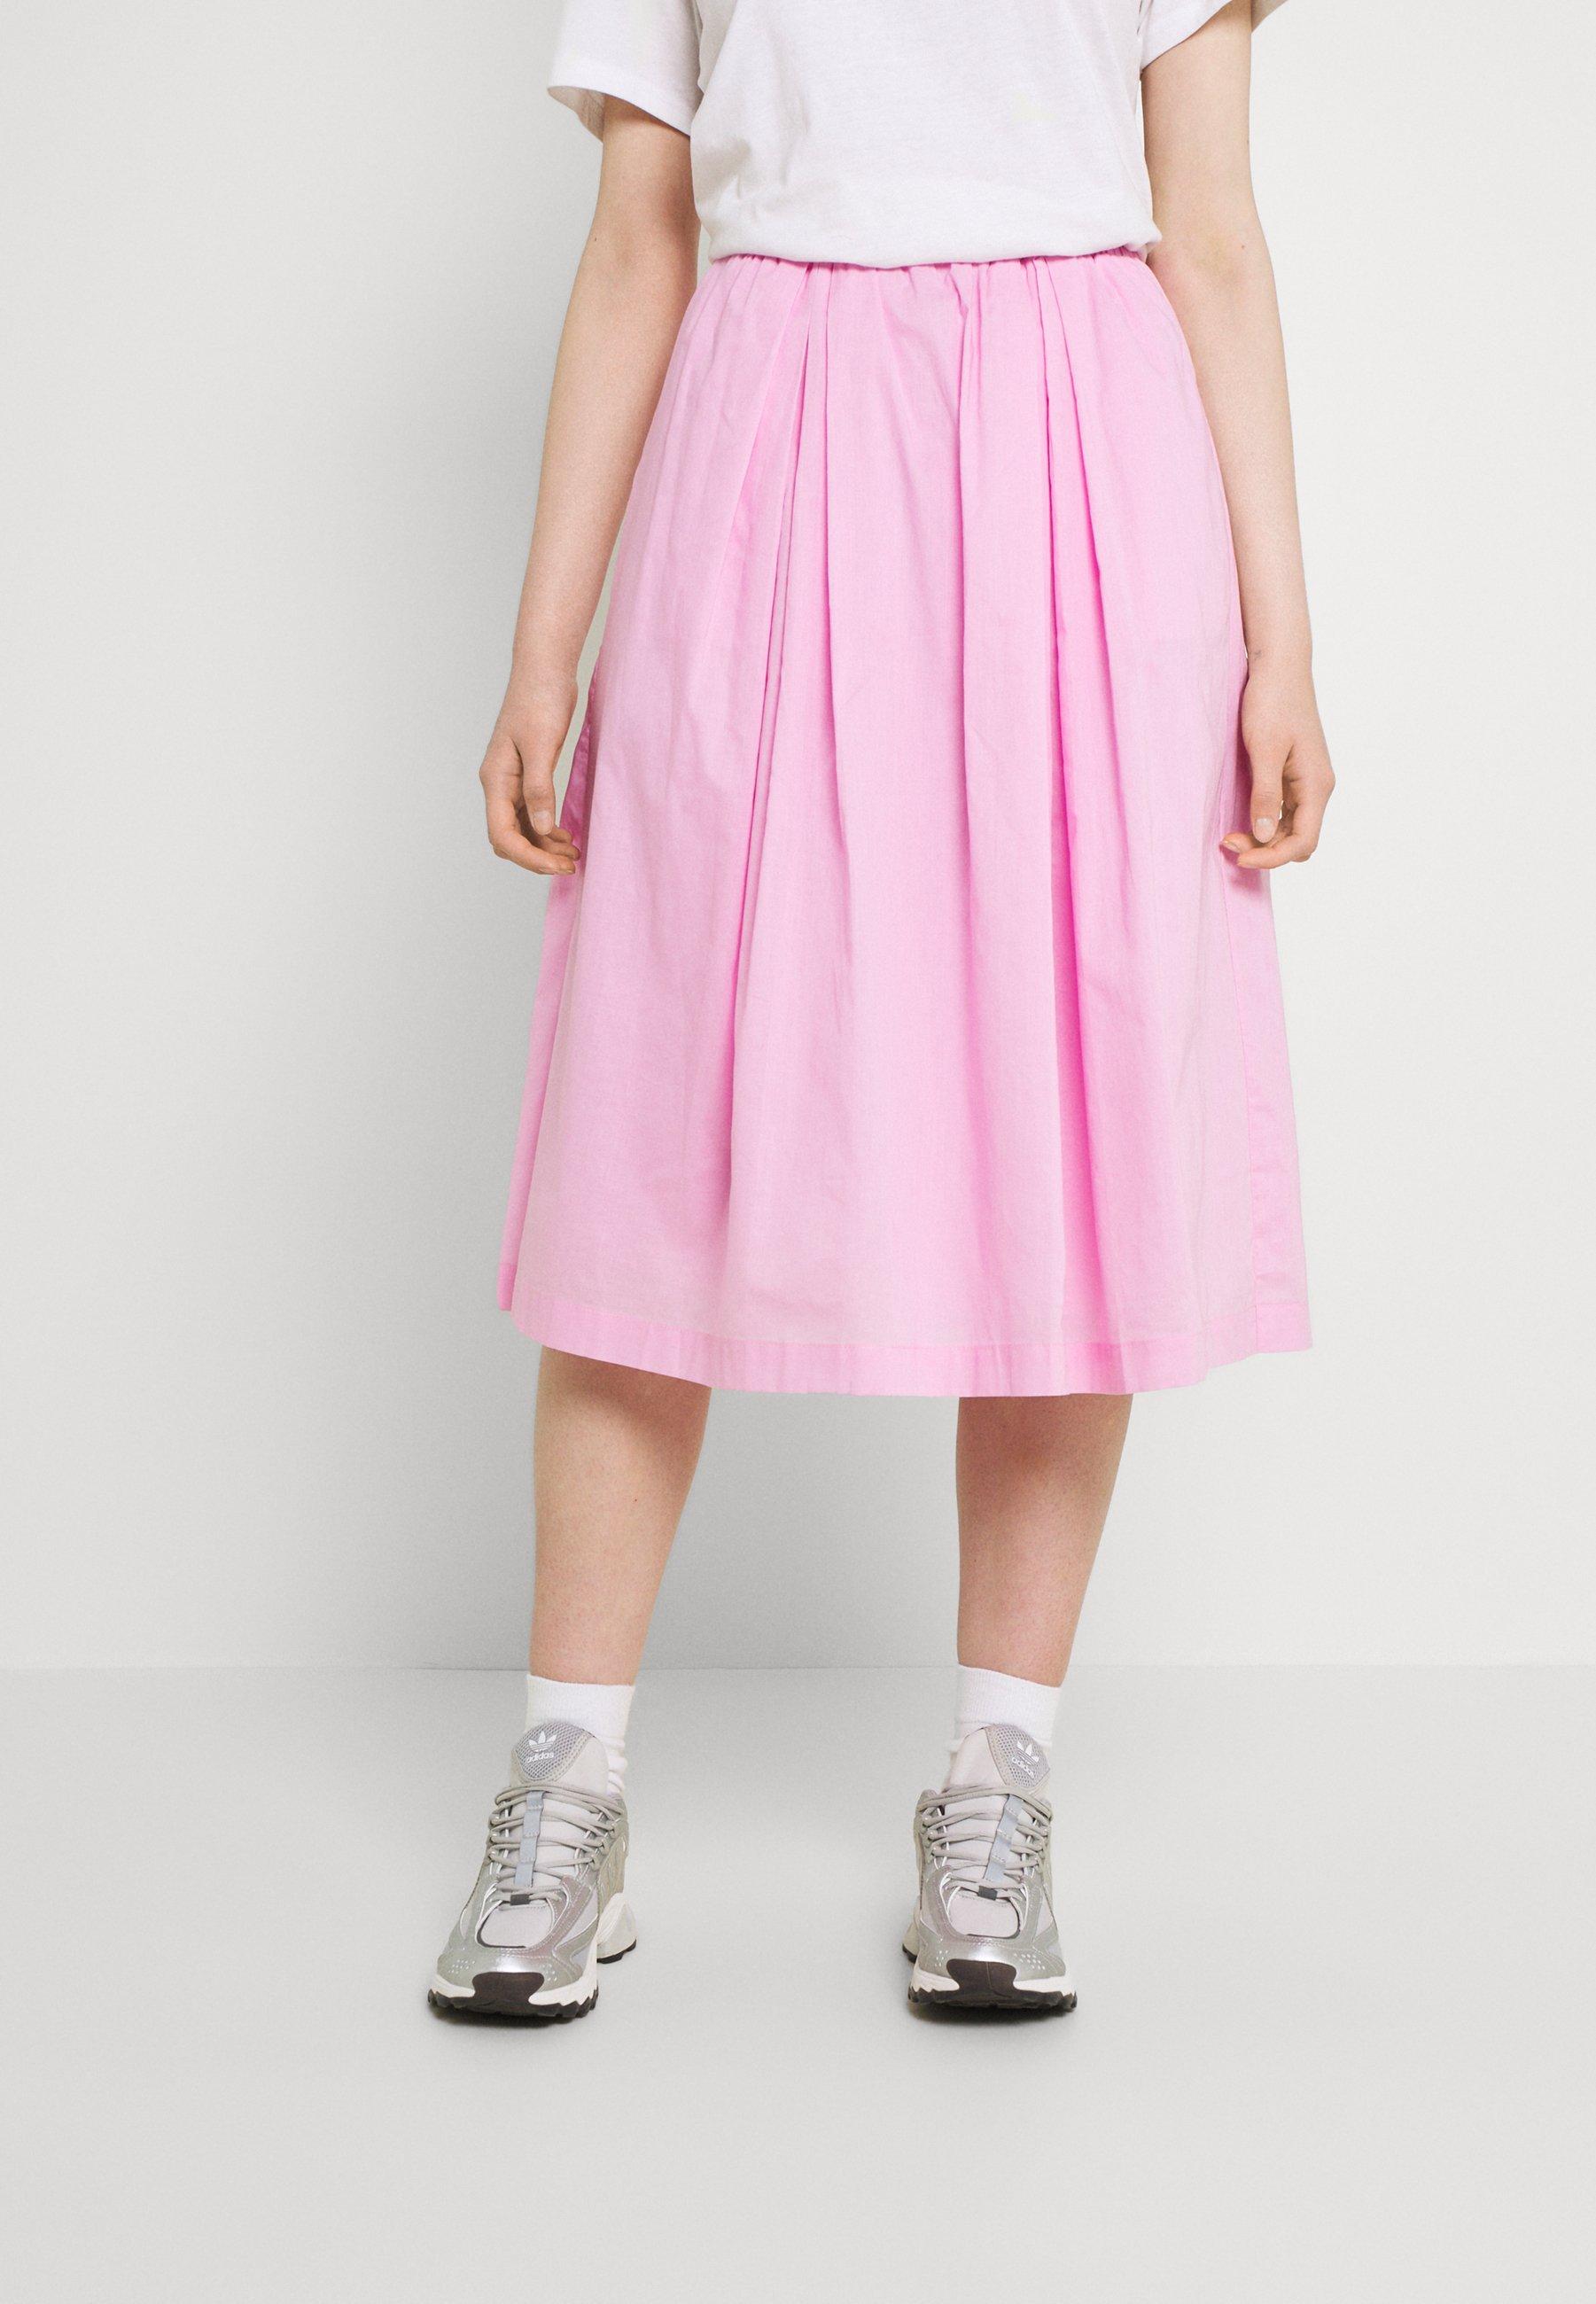 Femme LEILA SKIRT - Jupe plissée